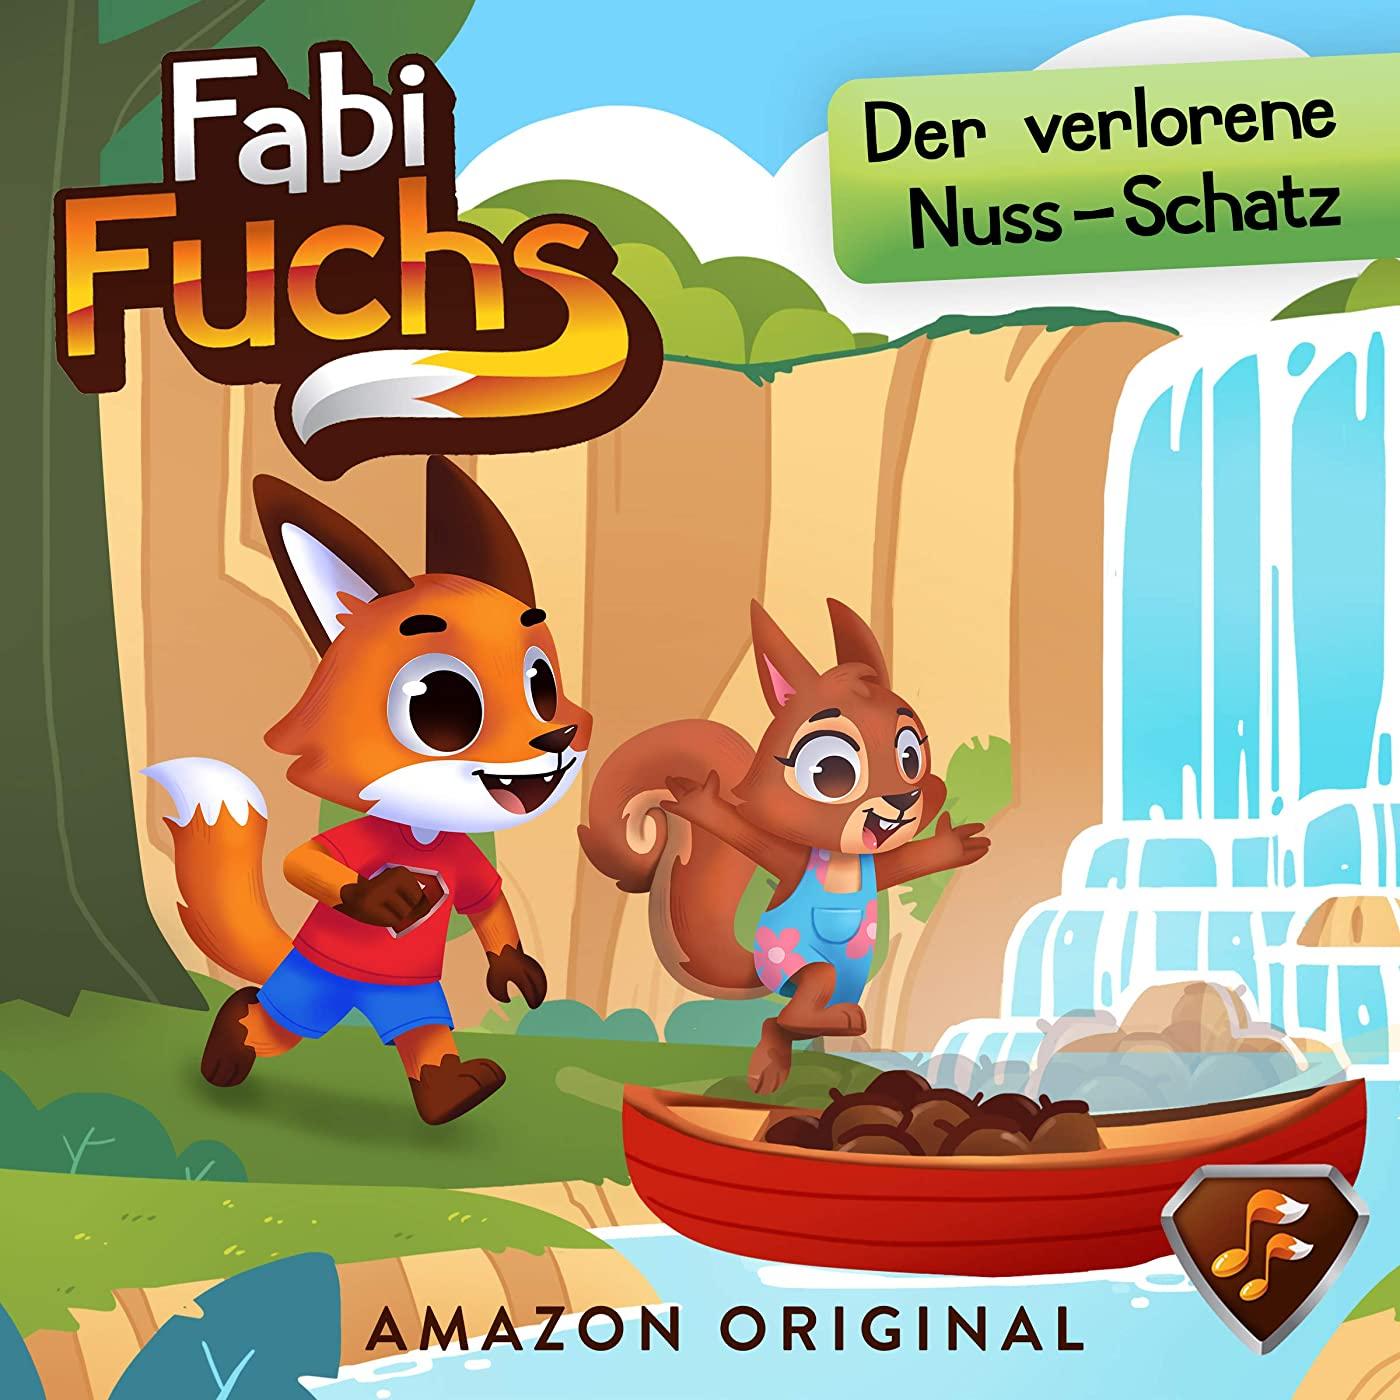 Fabi Fuchs auf Gratis-Hoerspiele.de   Kostenlose legale